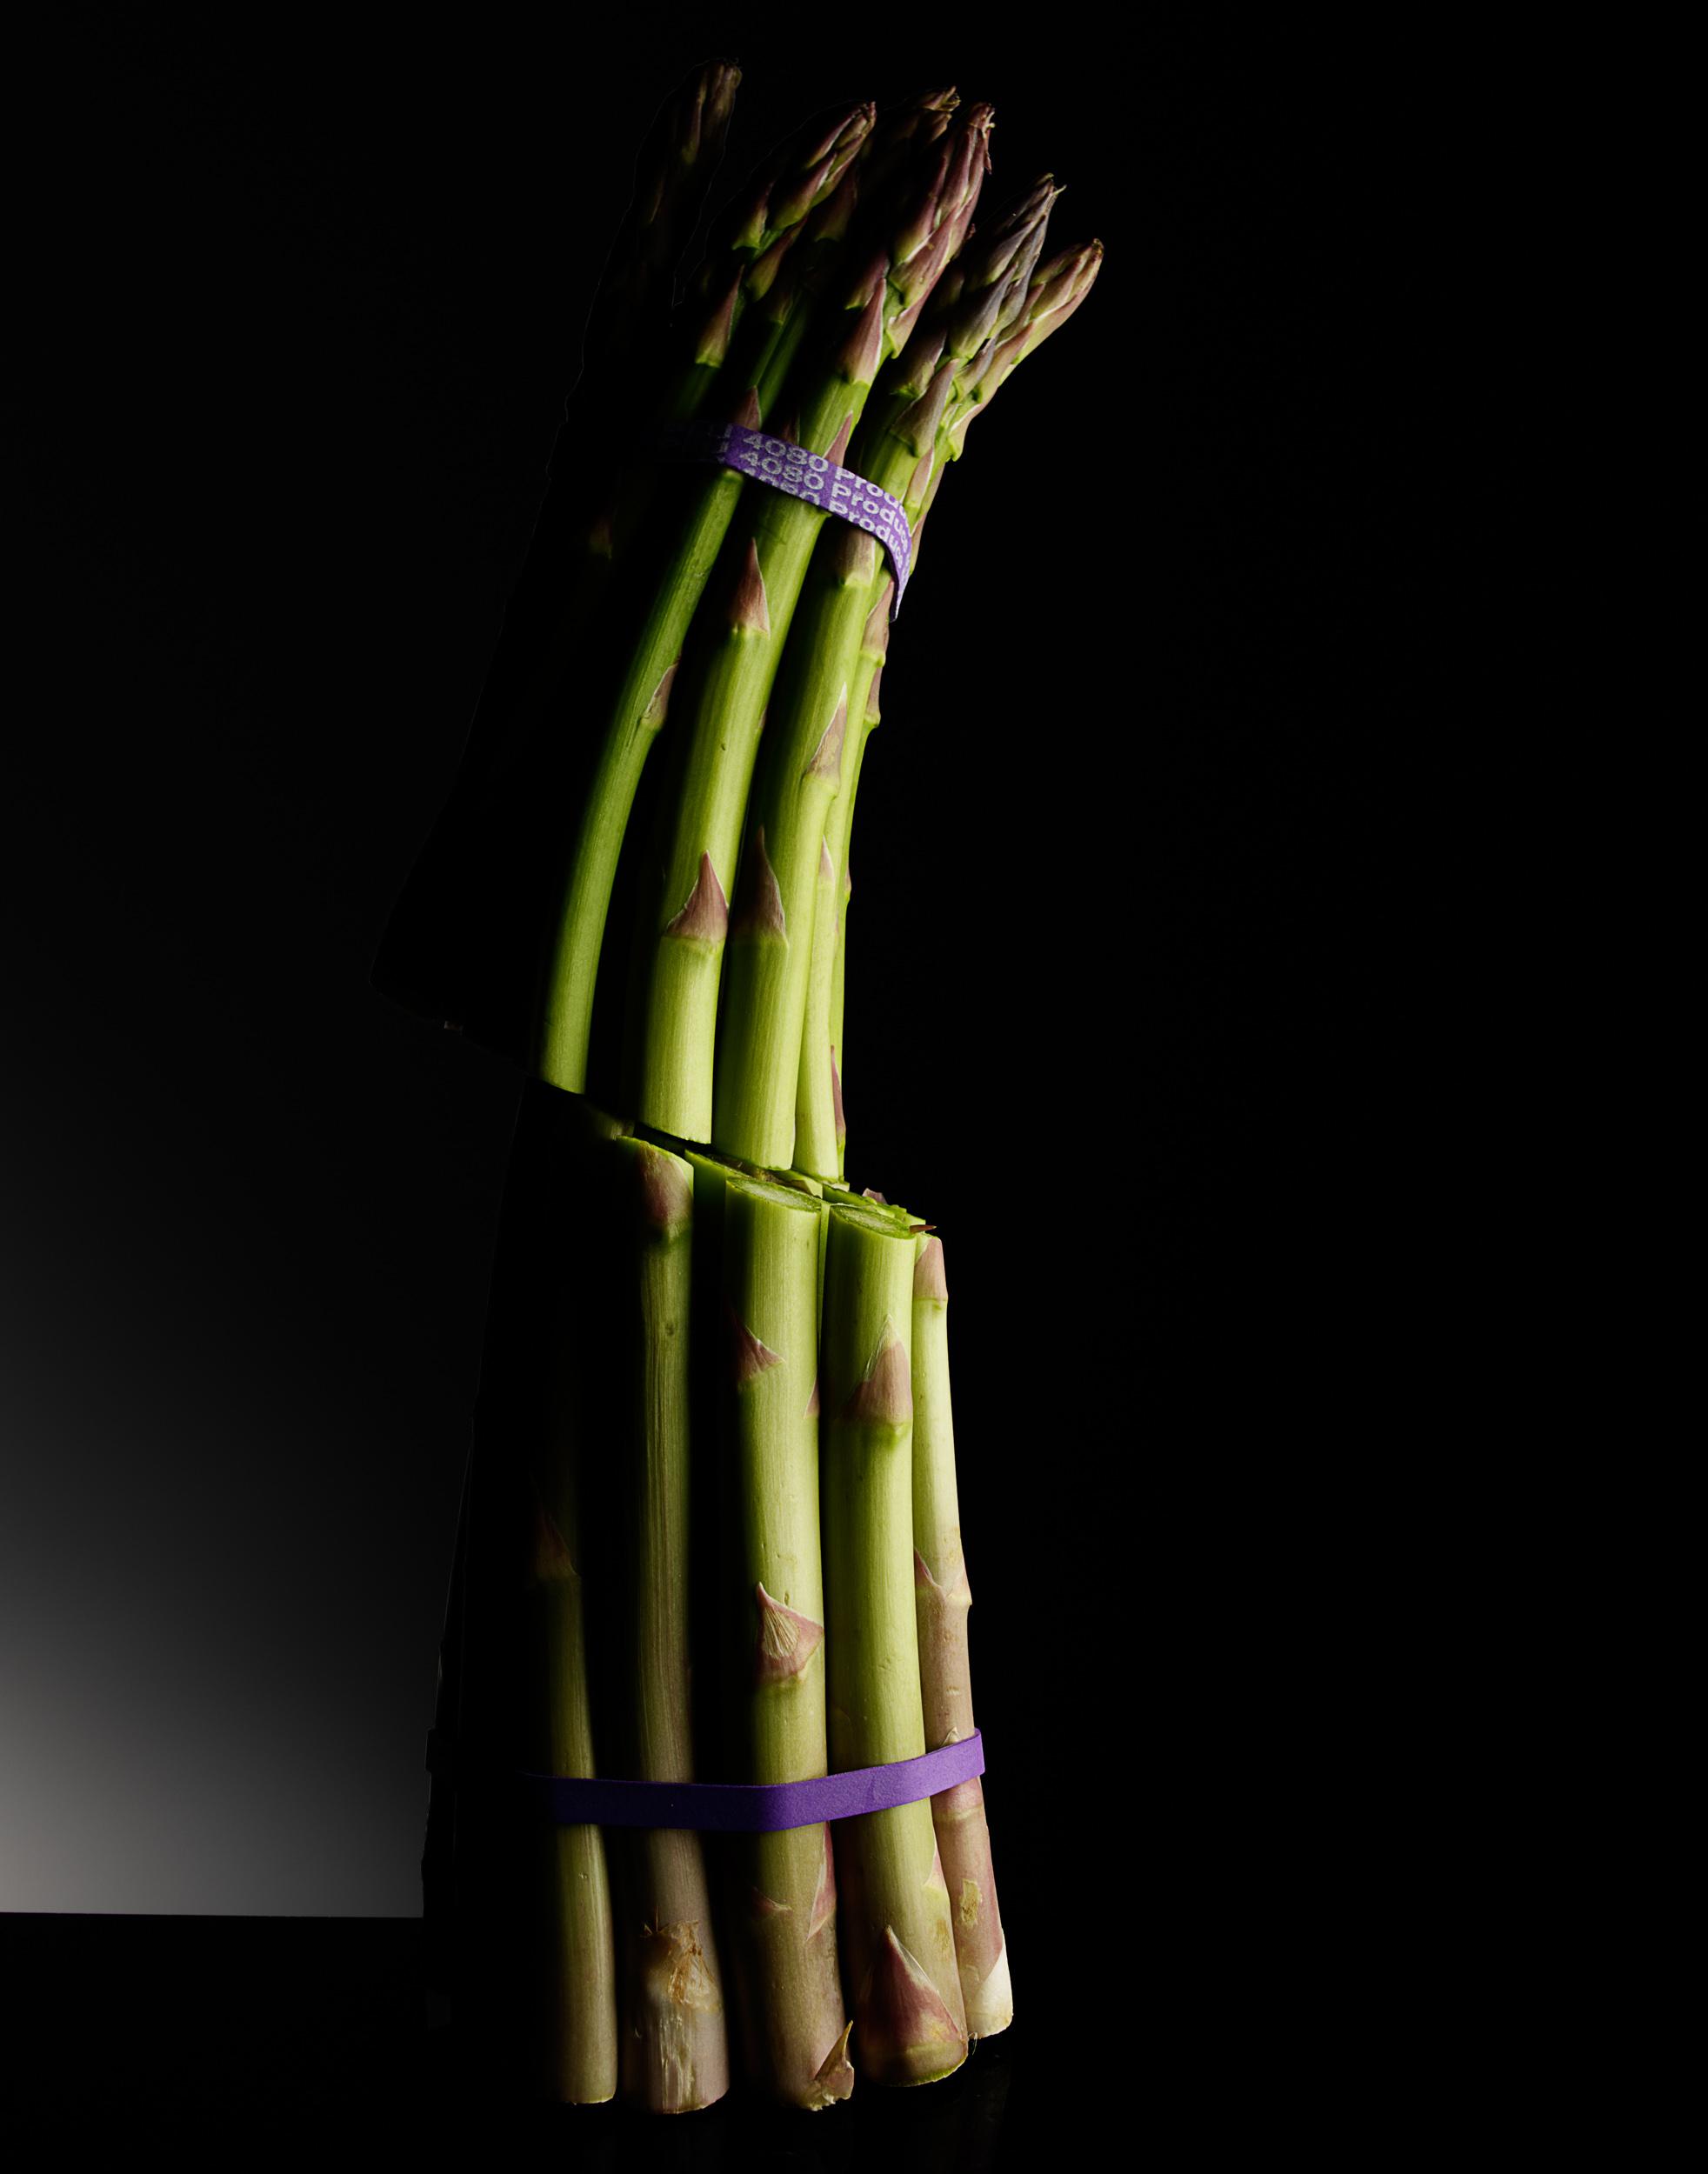 +++asparagus_006crp_RS_v2.jpg